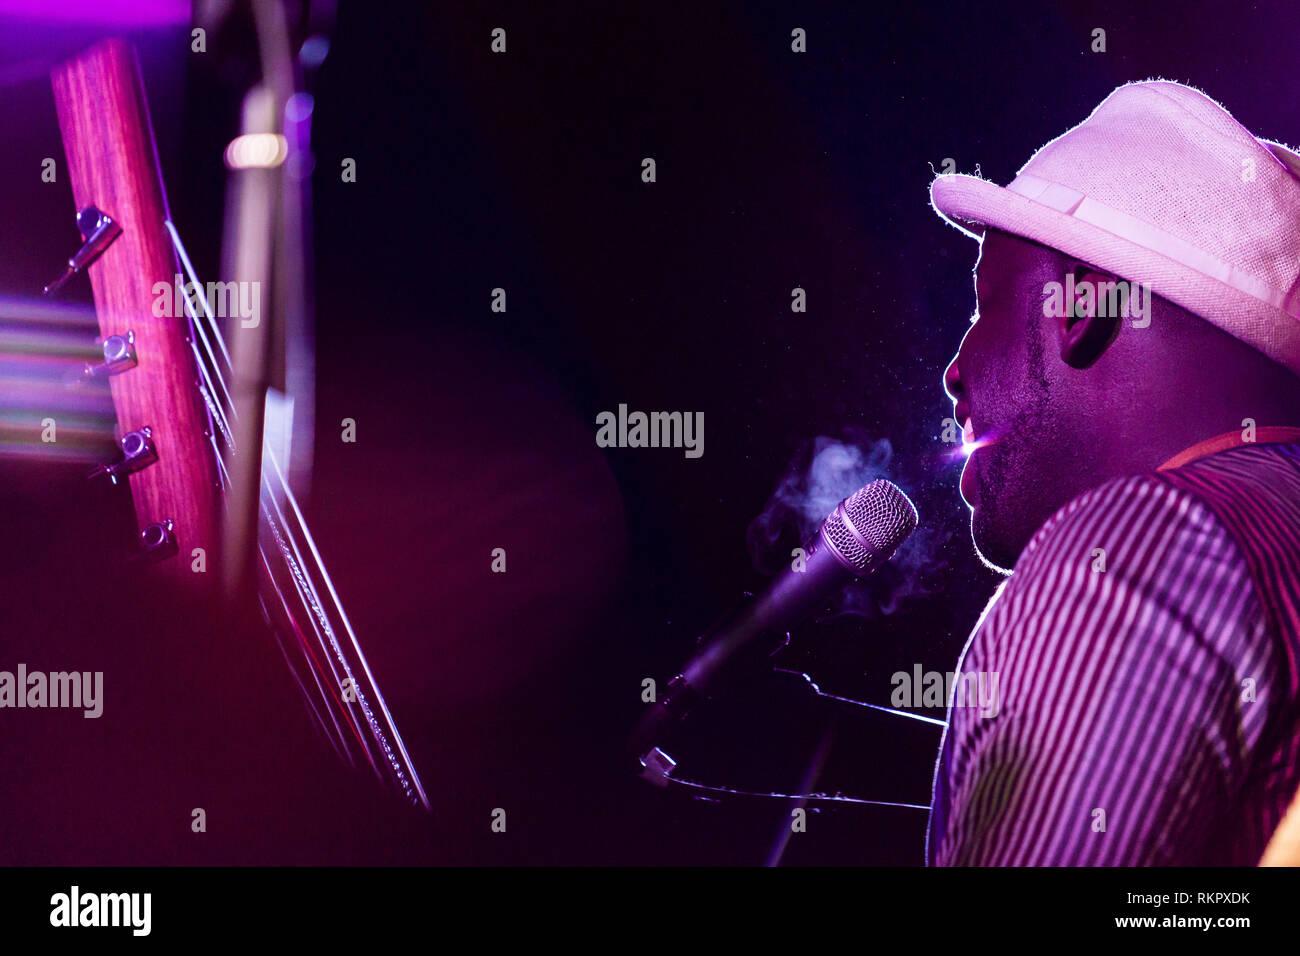 Seckou Keita plays the kora live at Beltane Fire Festival, East Sussex, UK - Stock Image